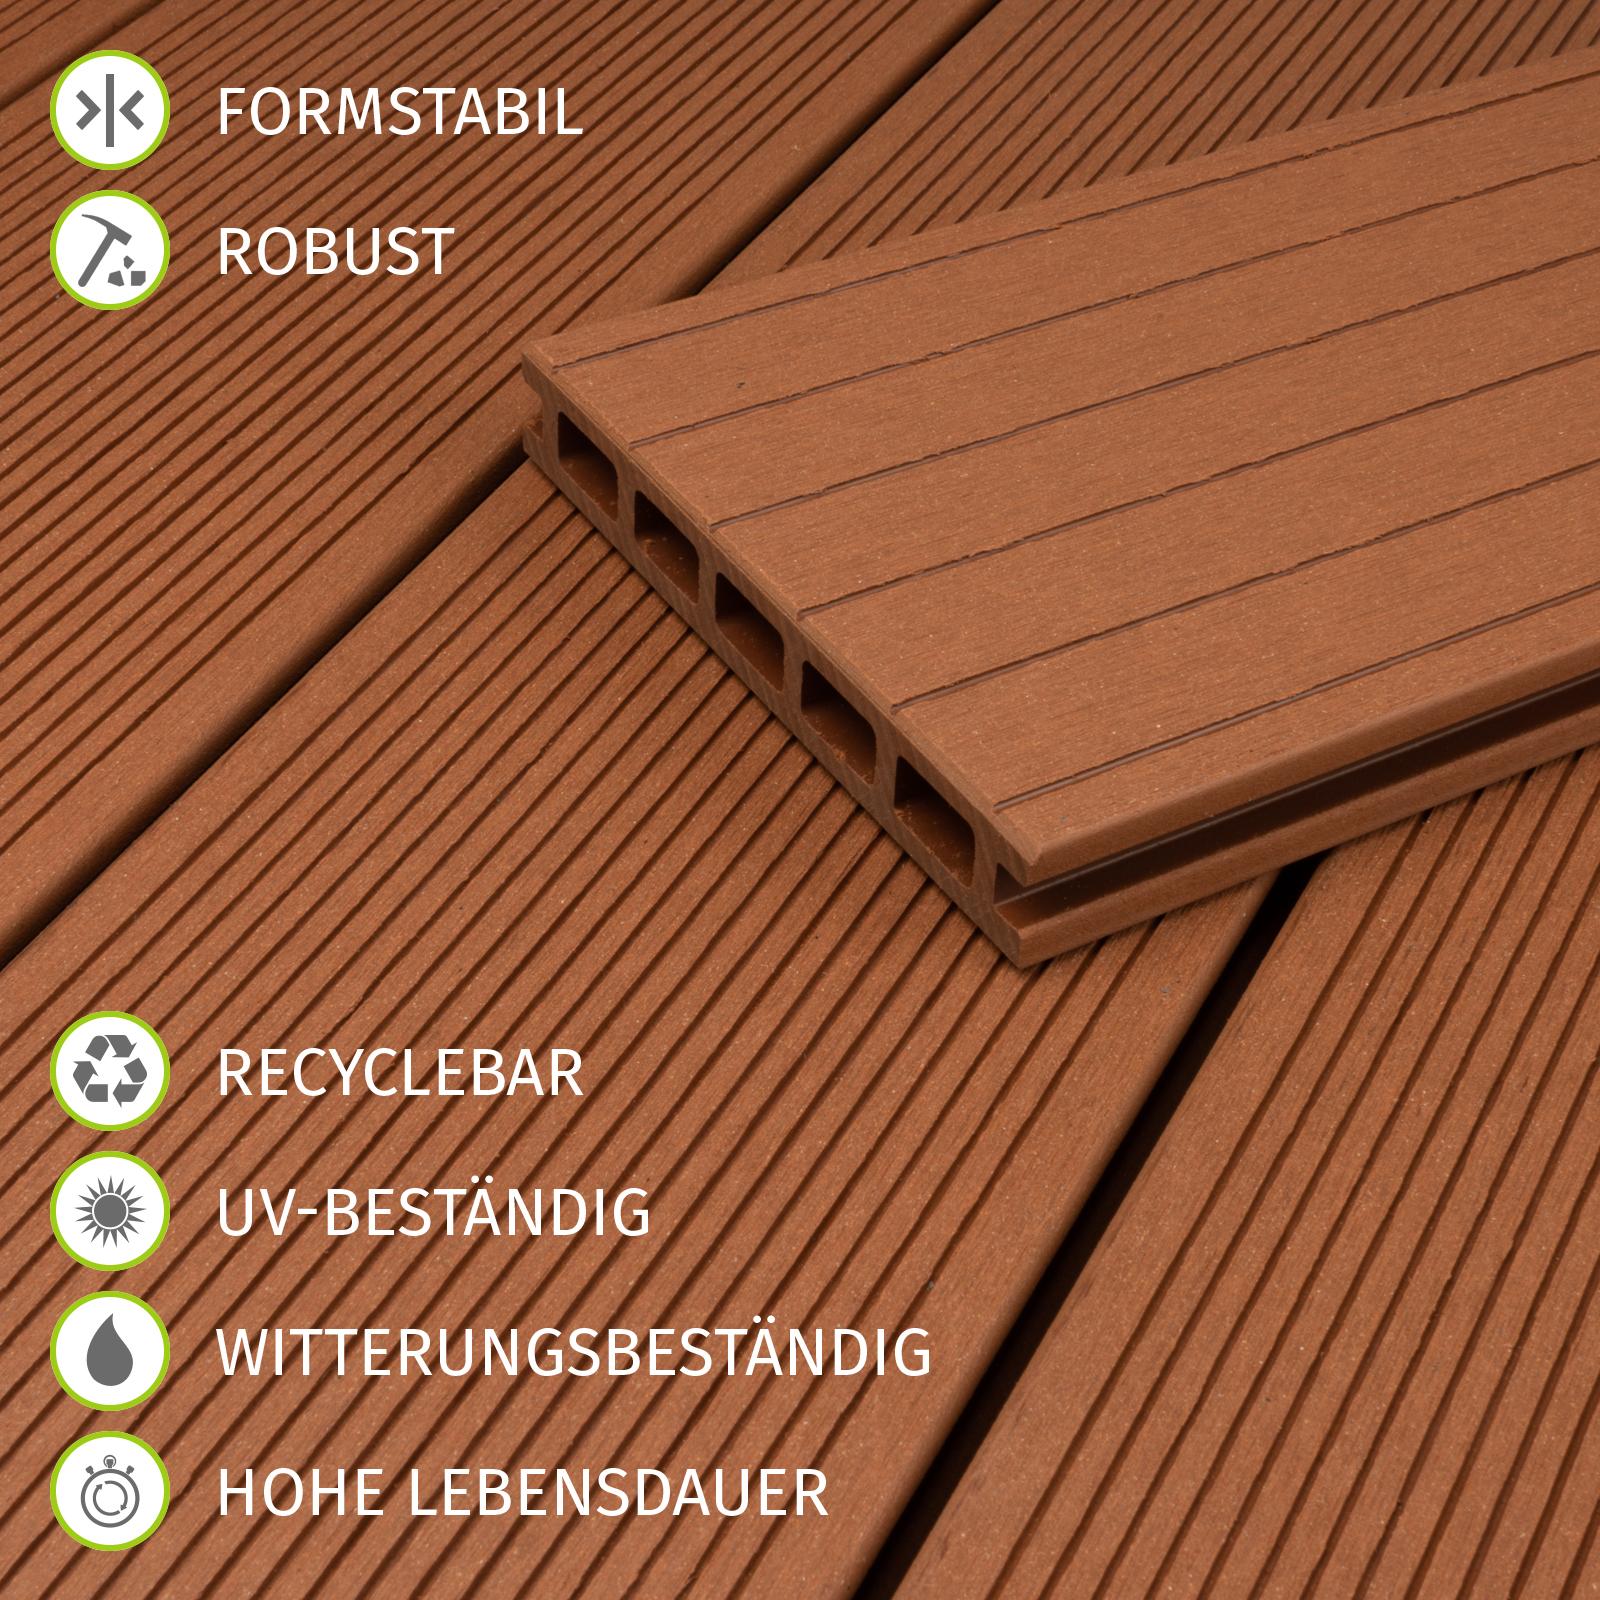 80 m² BPC Komplettset Terrassendielen Bambus Holz Komplettbausatz anthrazit  WPC